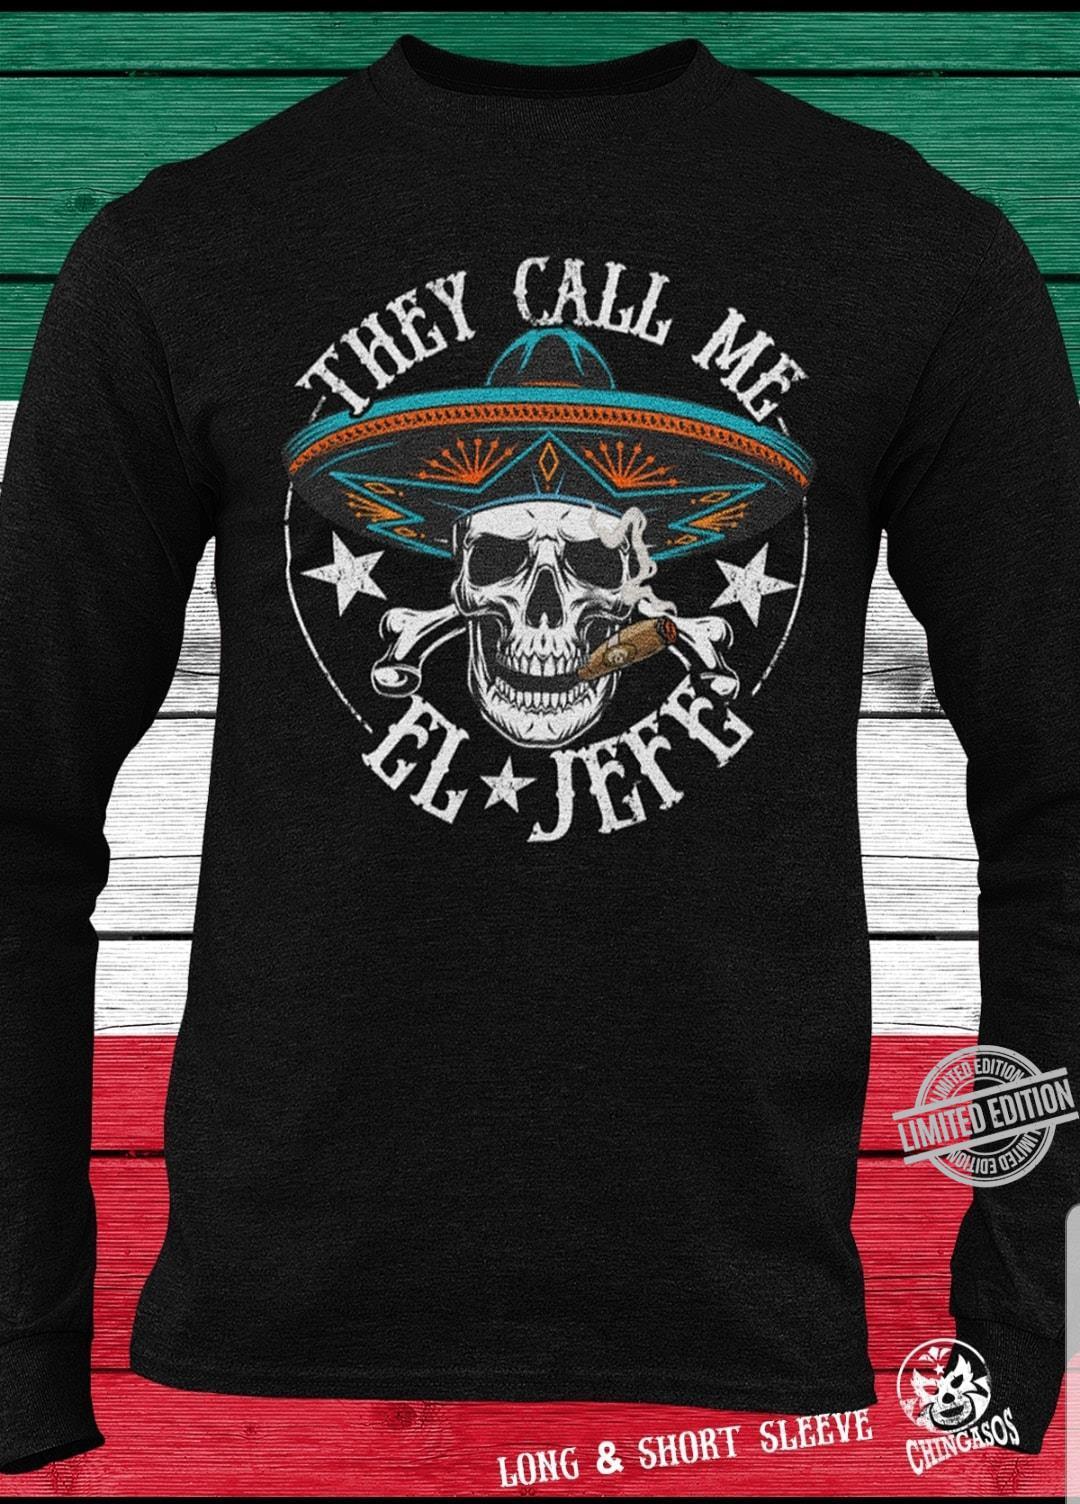 They Call Me El Jefe Shirt